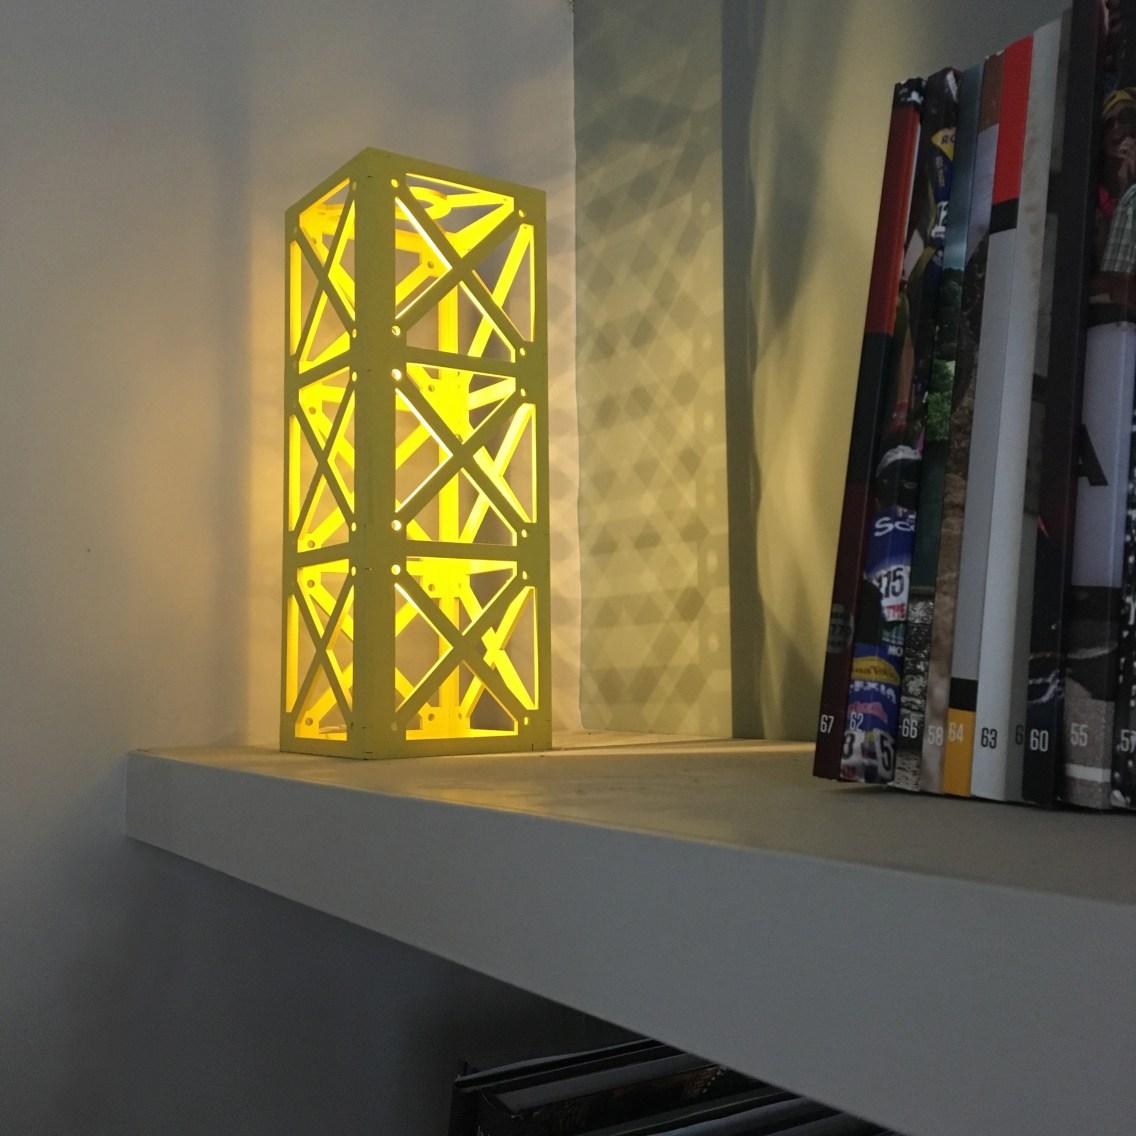 PLYable_4mmTrussLamp_3Bay_LED_Yellow_Scene_002